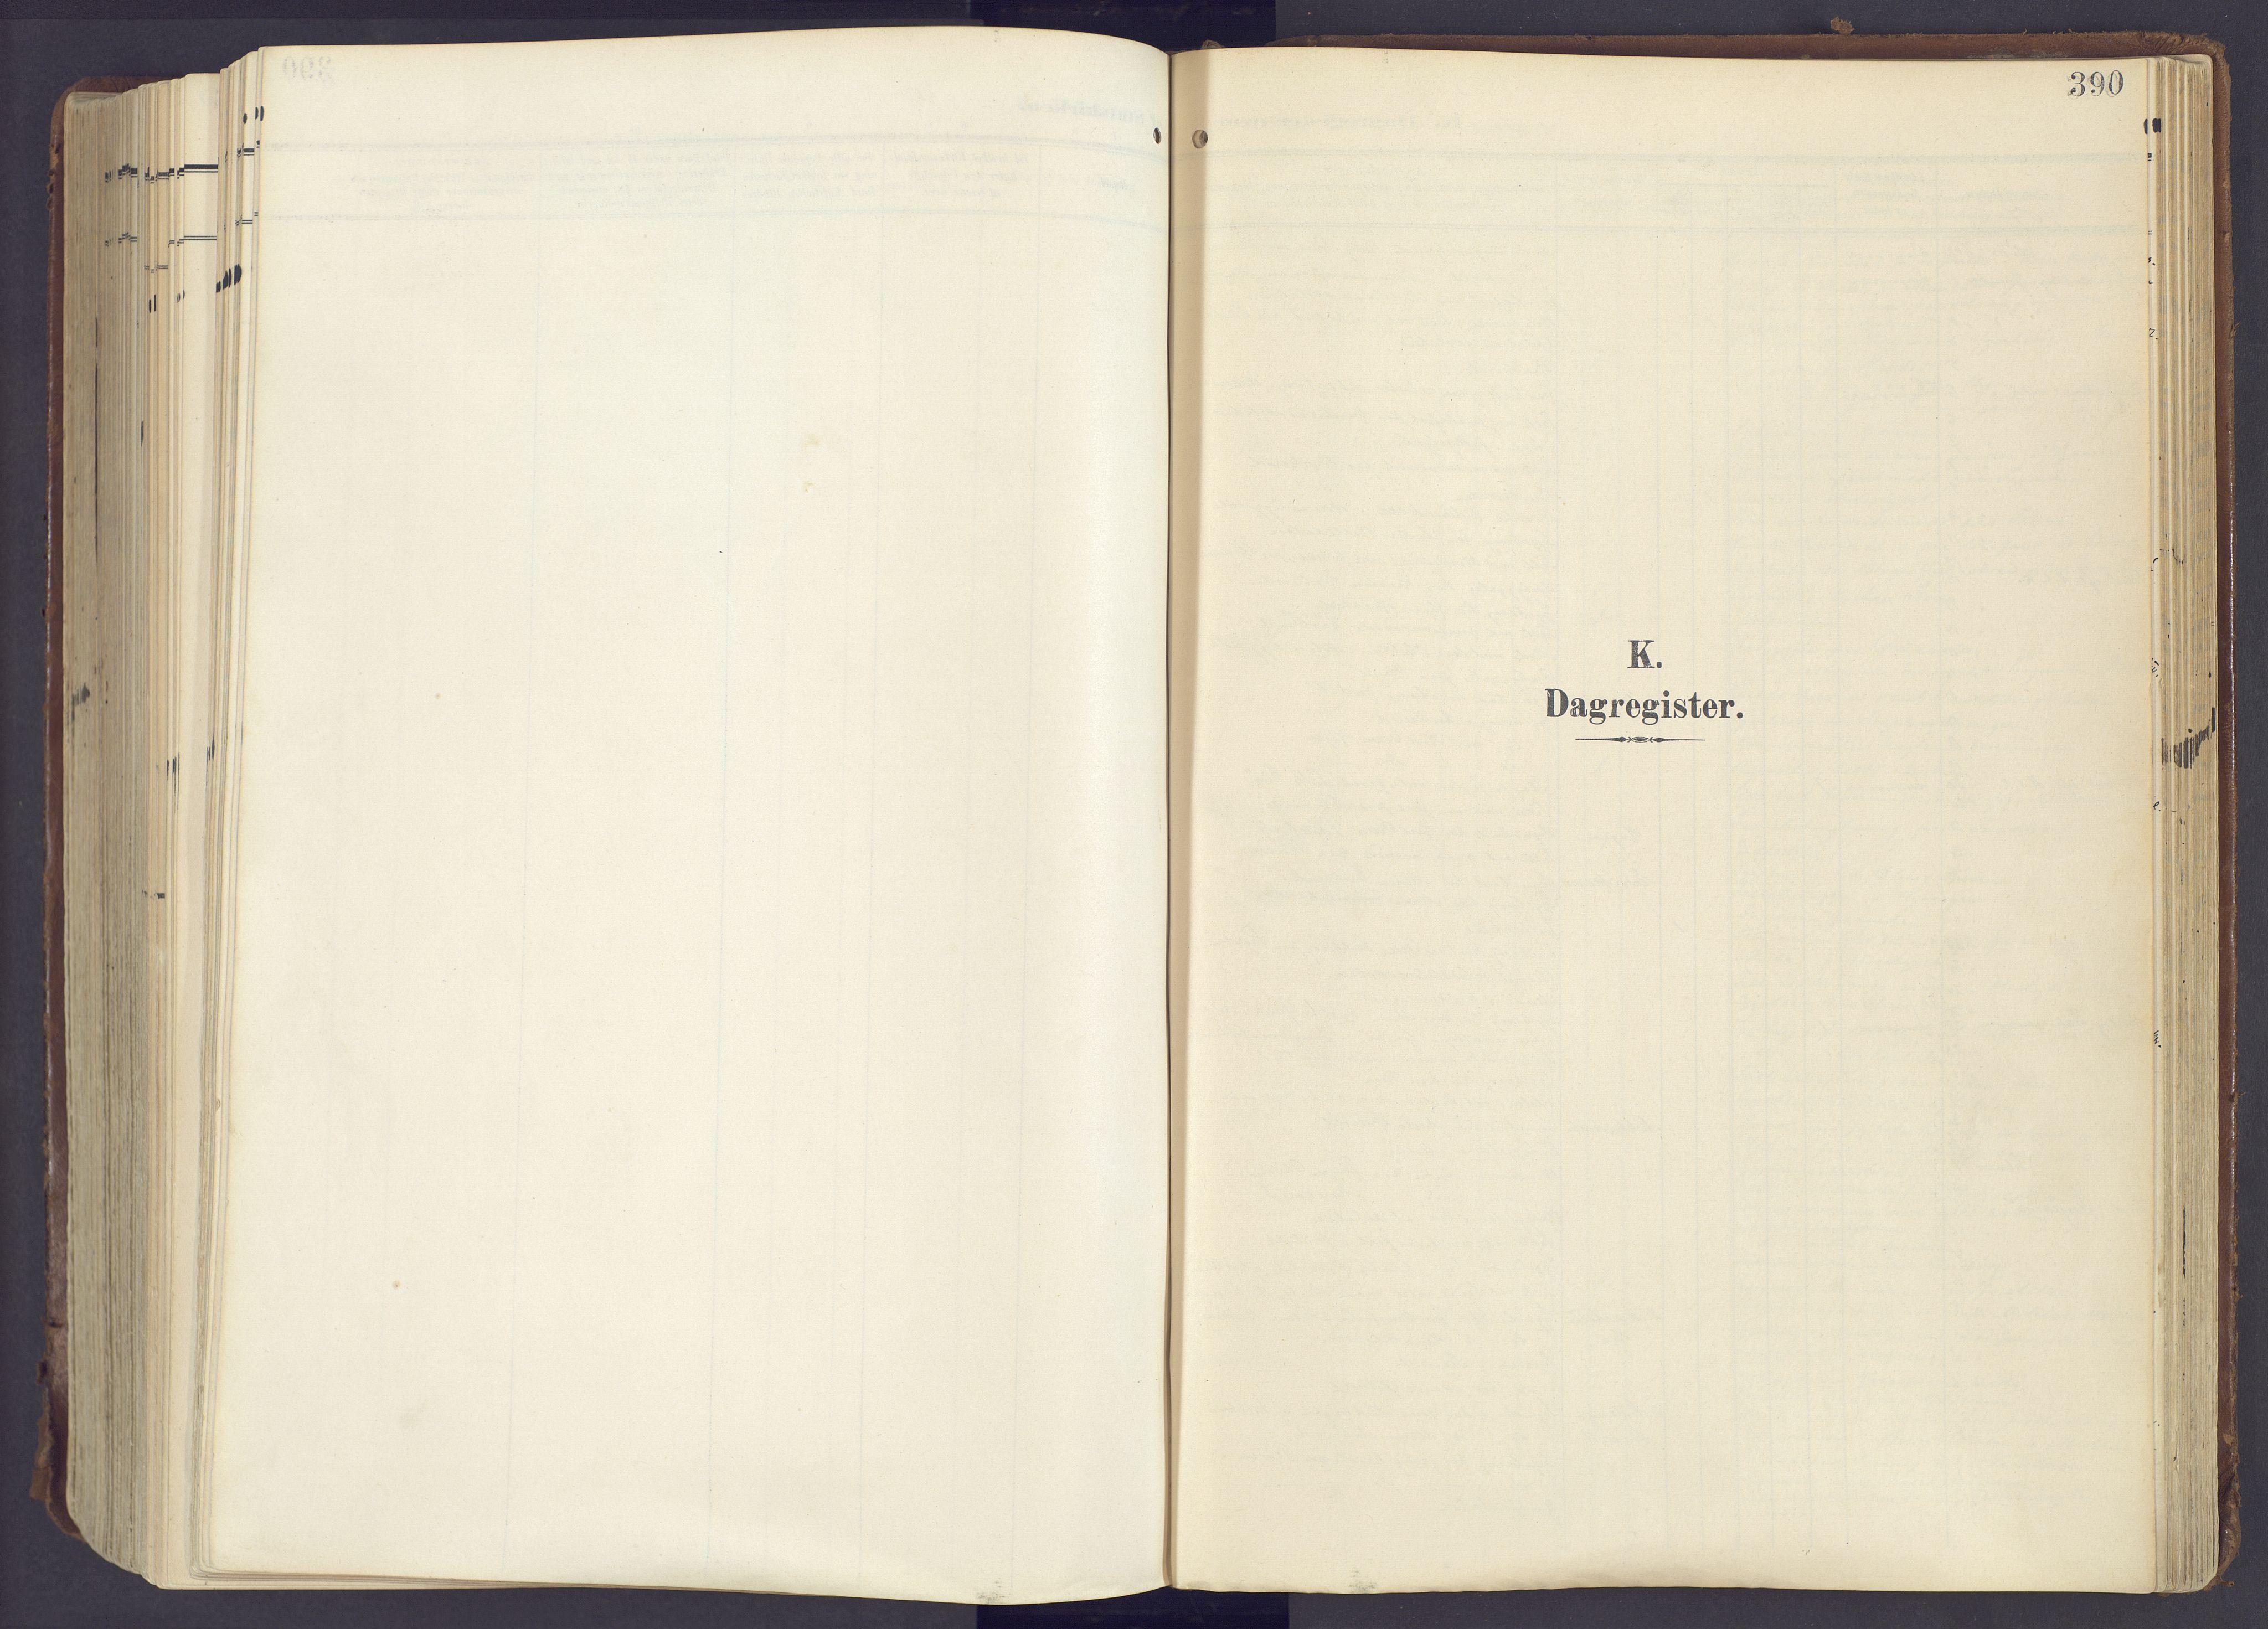 SAH, Lunner prestekontor, H/Ha/Haa/L0001: Ministerialbok nr. 1, 1907-1922, s. 390